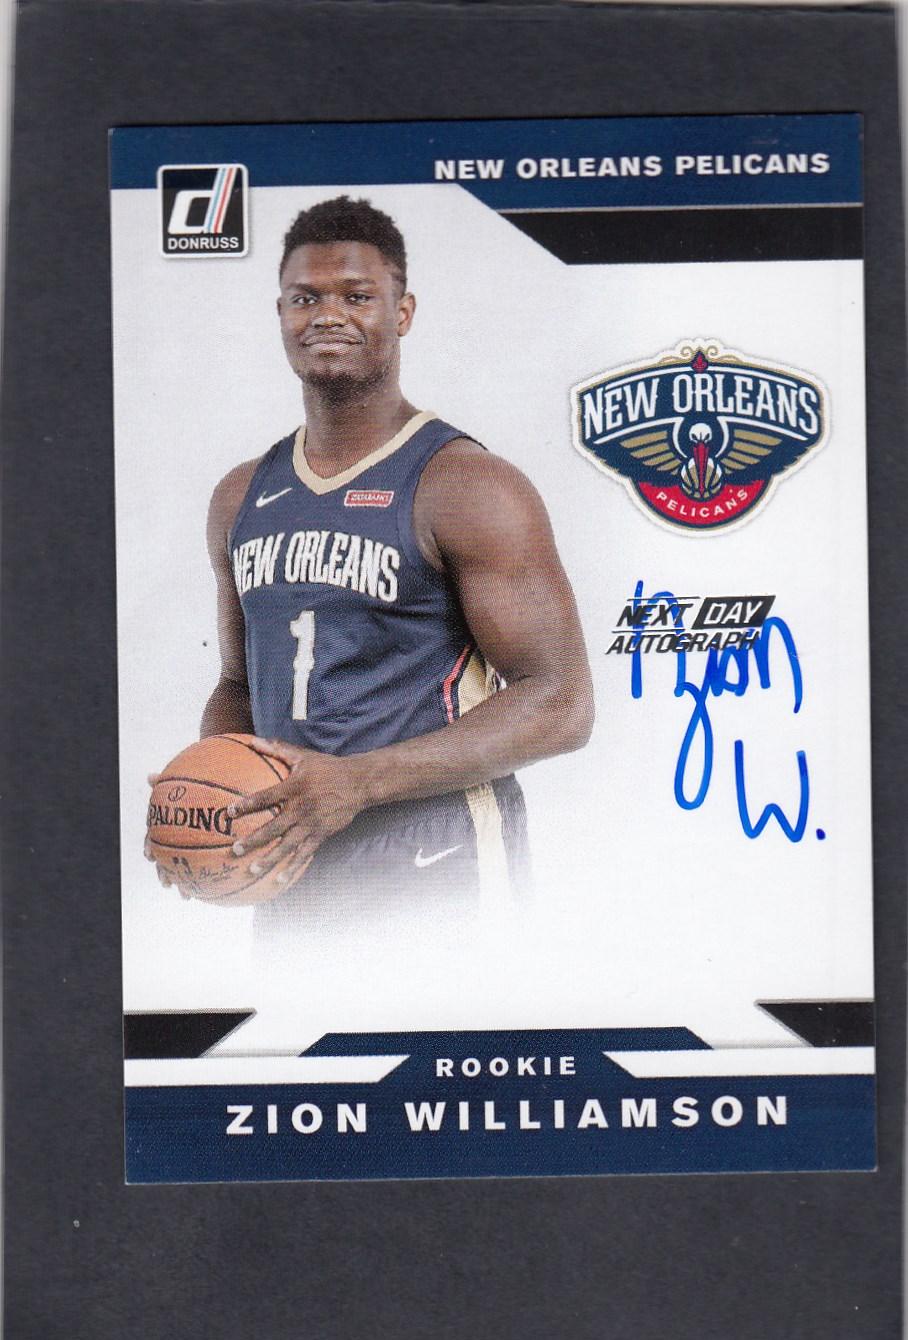 Zion Williamson 胖虎 蔡恩威廉姆斯 2019-20 Donruss Next Day RC 新秀 签字 SP 卡签 中的 经典版本